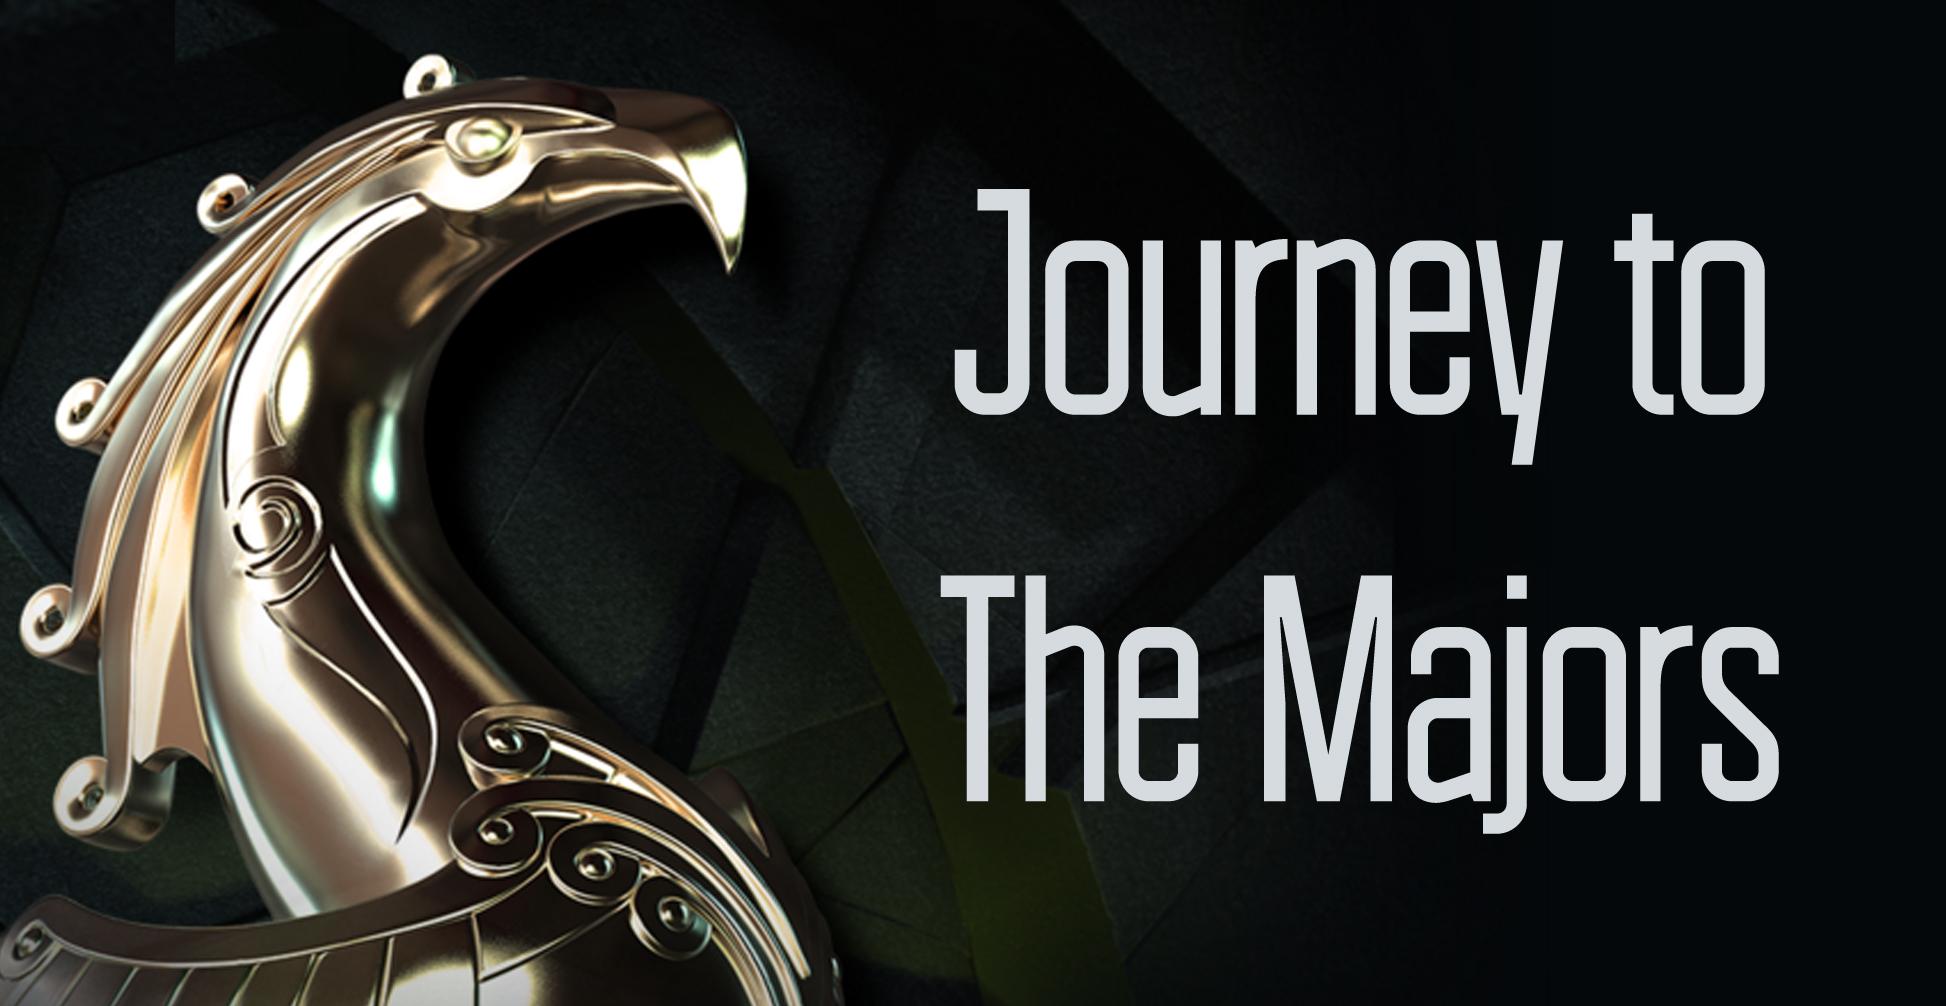 The Frankfurt Major 2015, CDEC Gaming